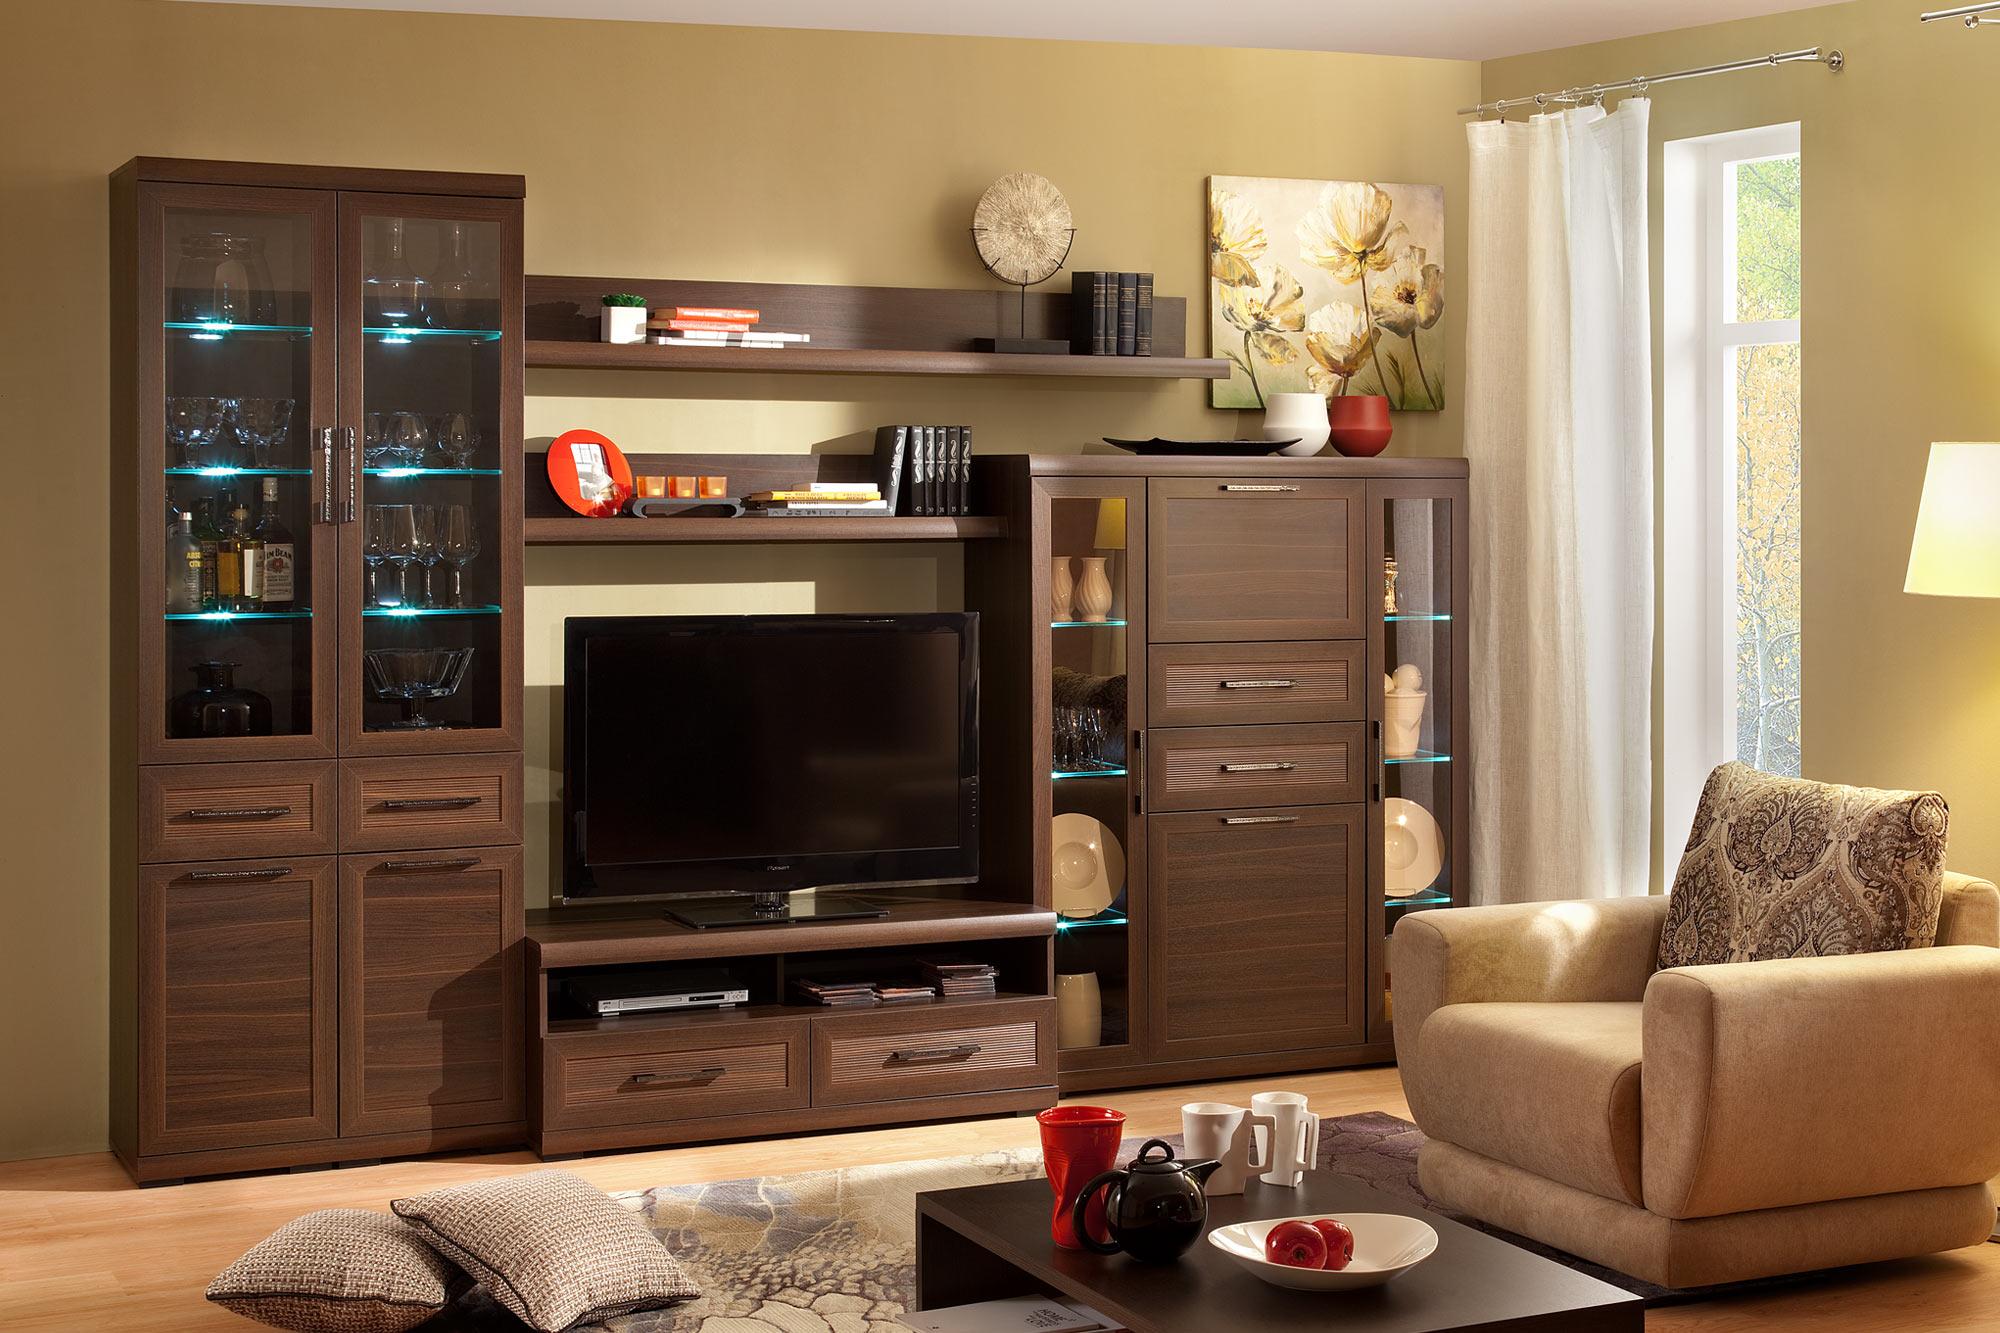 Мебельная фабрика кураж официальный сайт каталог цены